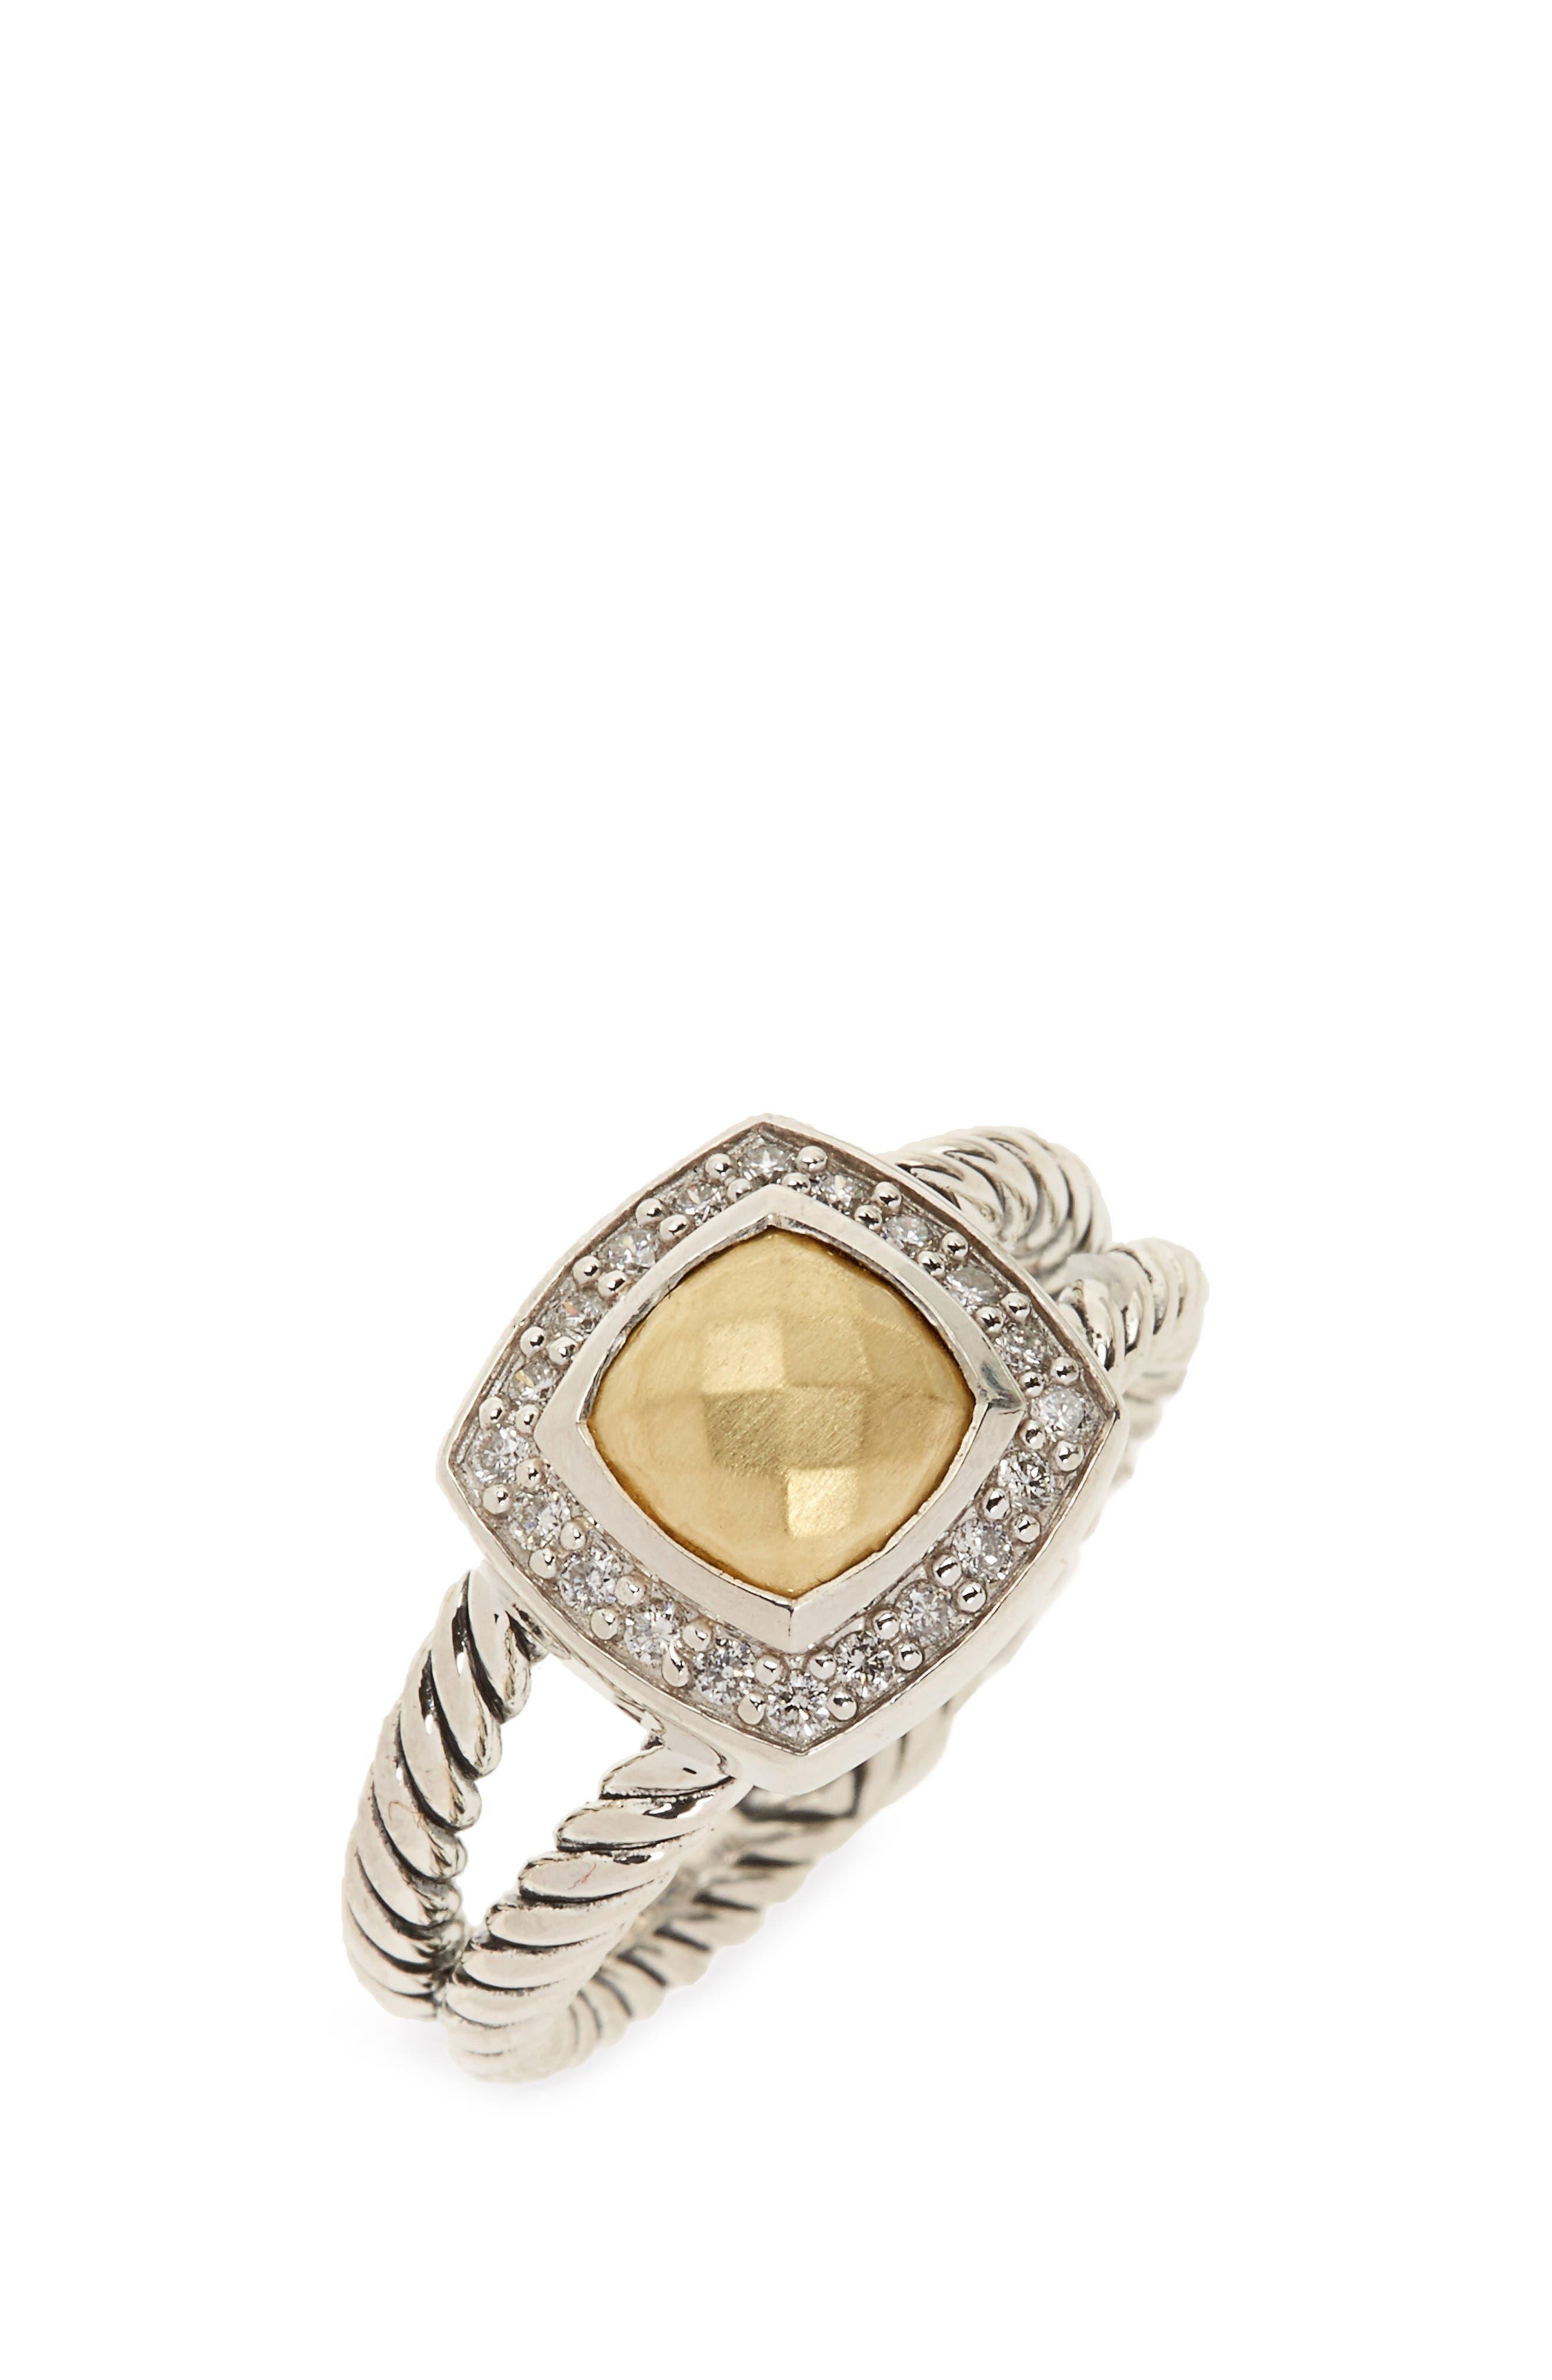 Petite Albion Ring with Semiprecious Stone & Diamonds,                             Main thumbnail 1, color,                             SILVER/ GOLD